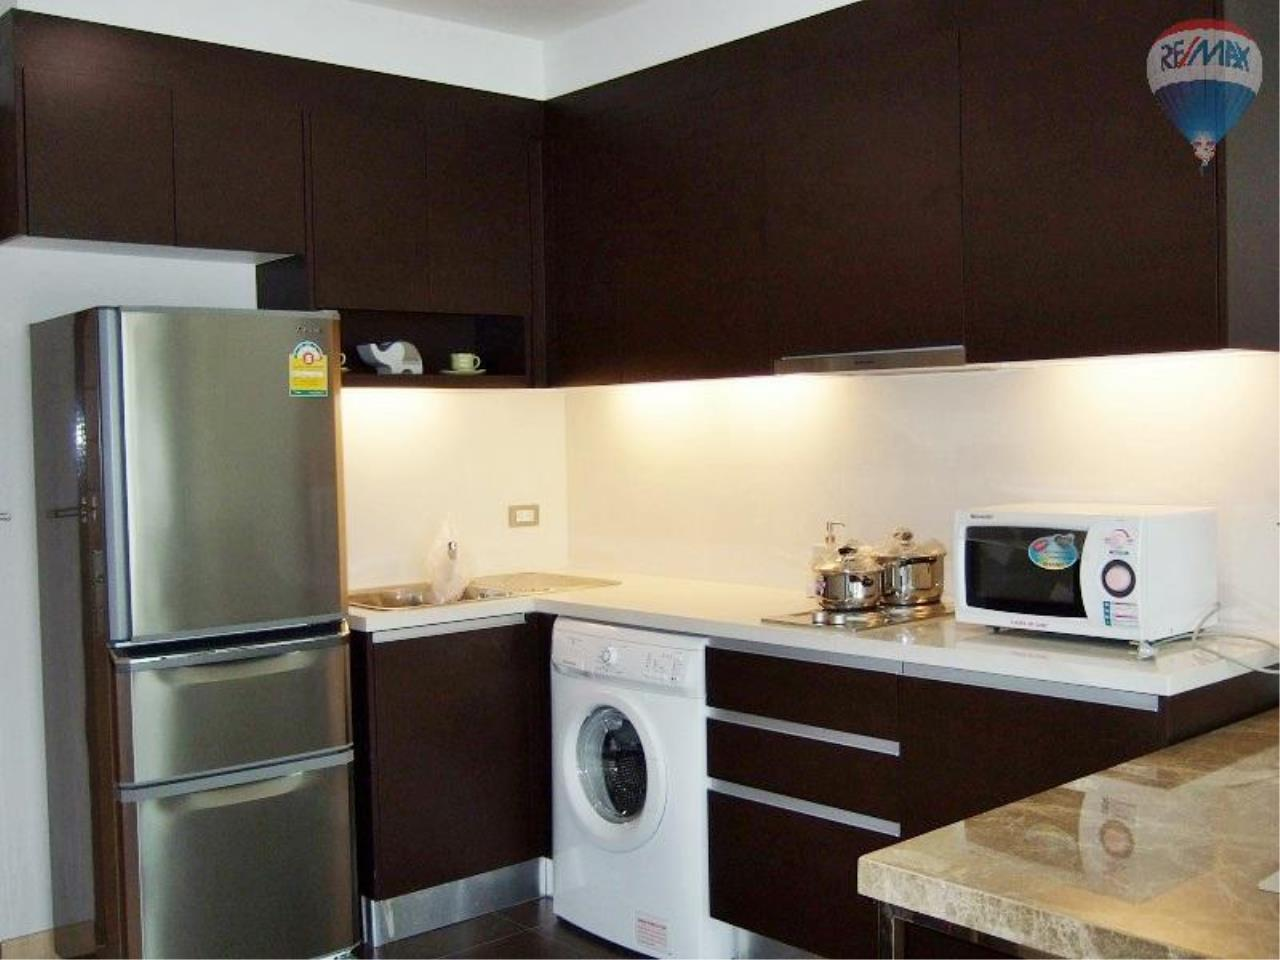 RE/MAX Properties Agency's Condominium for rent 2 bedrooms 66.17 Sq.m. at 59 Heritage 5